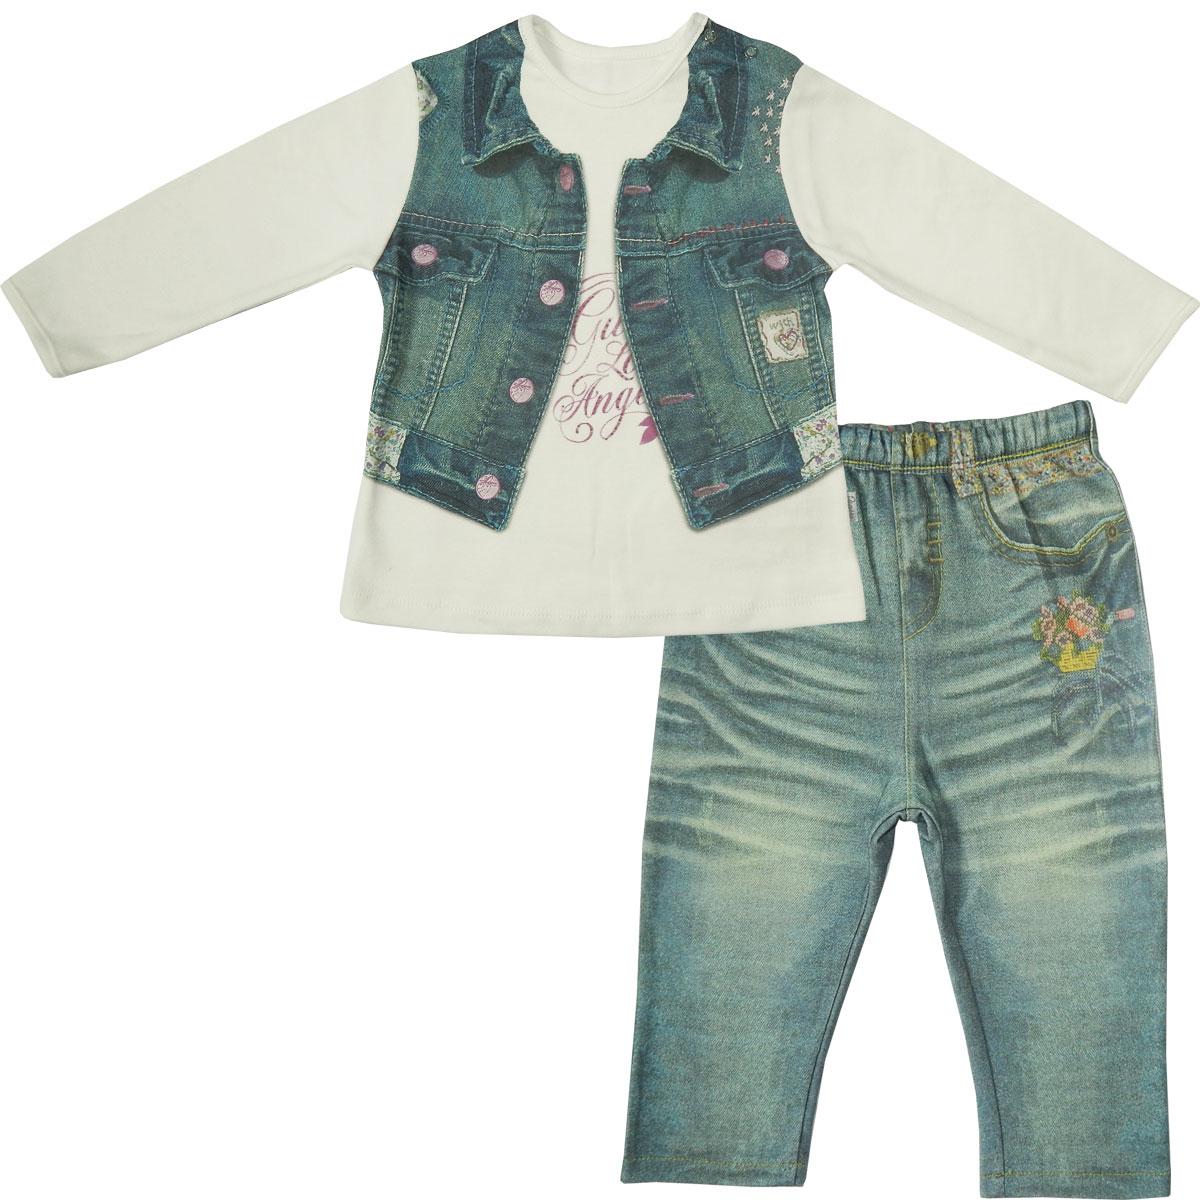 Комплект одежды Папитто для девочки Fashion Jeans 593-05 белый/синий р.24-86